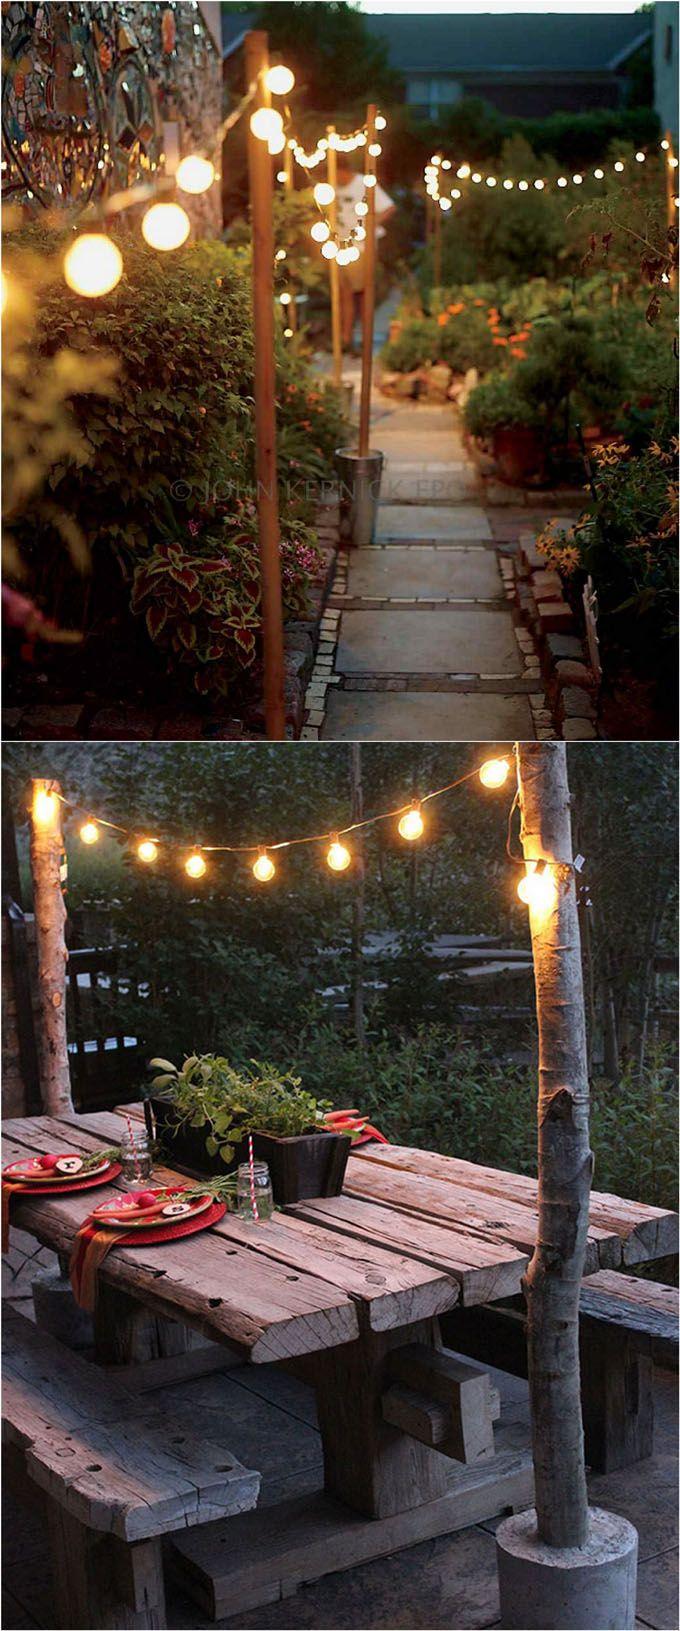 28 Stunning Diy Outdoor Lighting Ideas So Easy Garten Und Outdoor Hinterhofbeleuchtung Und Gartenbeleuchtung